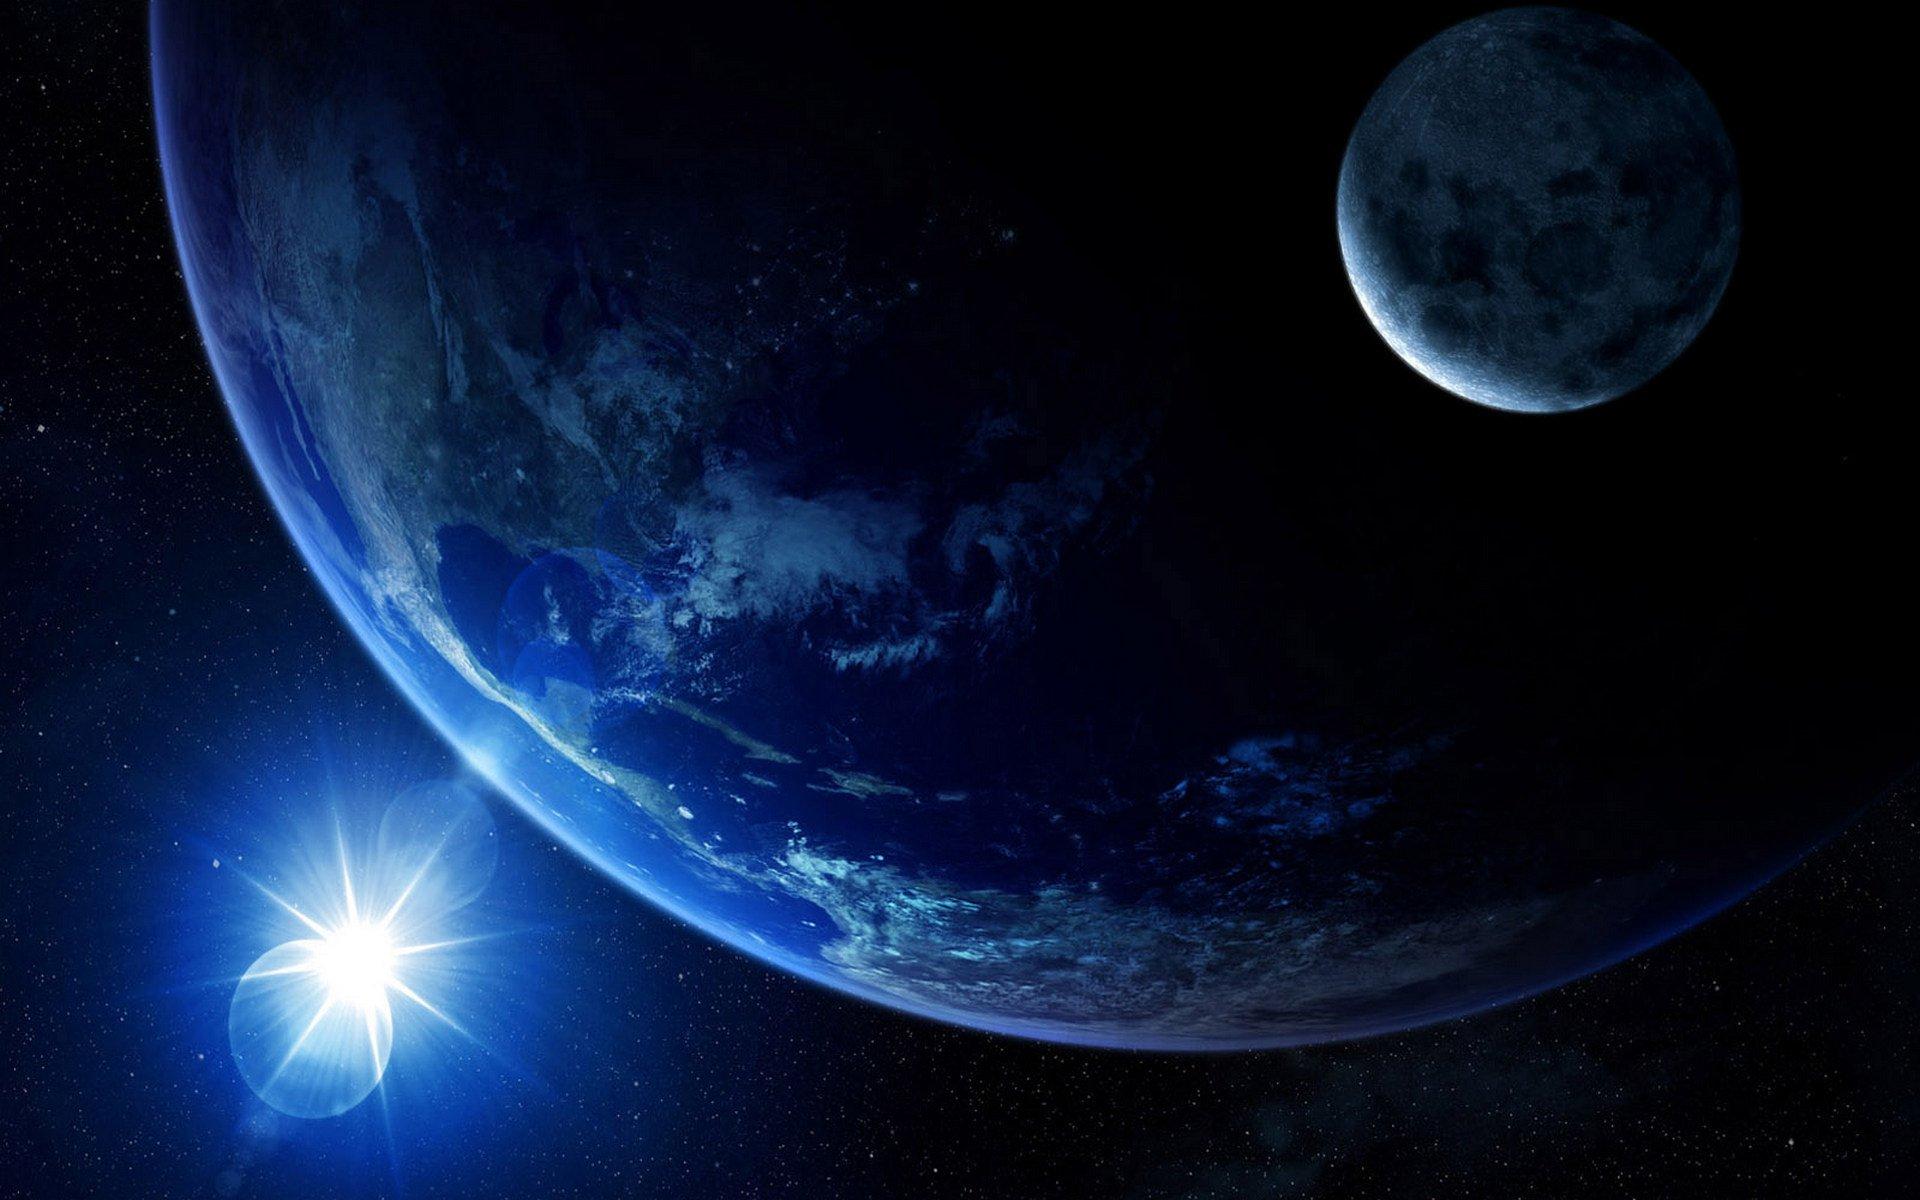 Sci Fi - Planets  Space Sci Fi Planet Eclipse Sun Moon Wallpaper